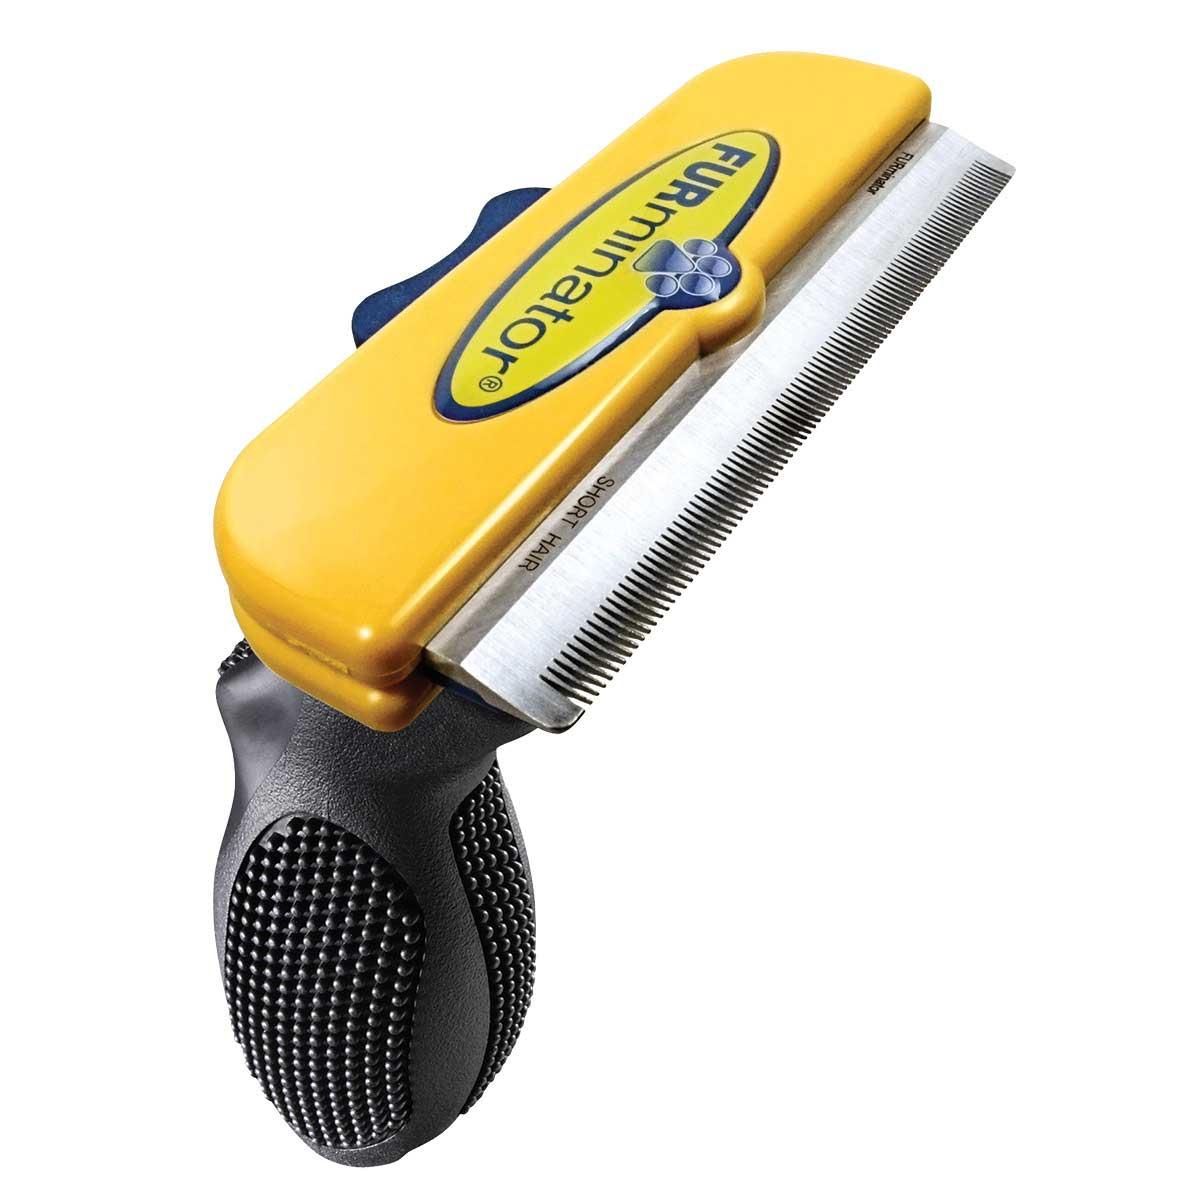 Furminator Large Dog 4 inch Deshedding Tool for Short Hair 51-90 Lbs